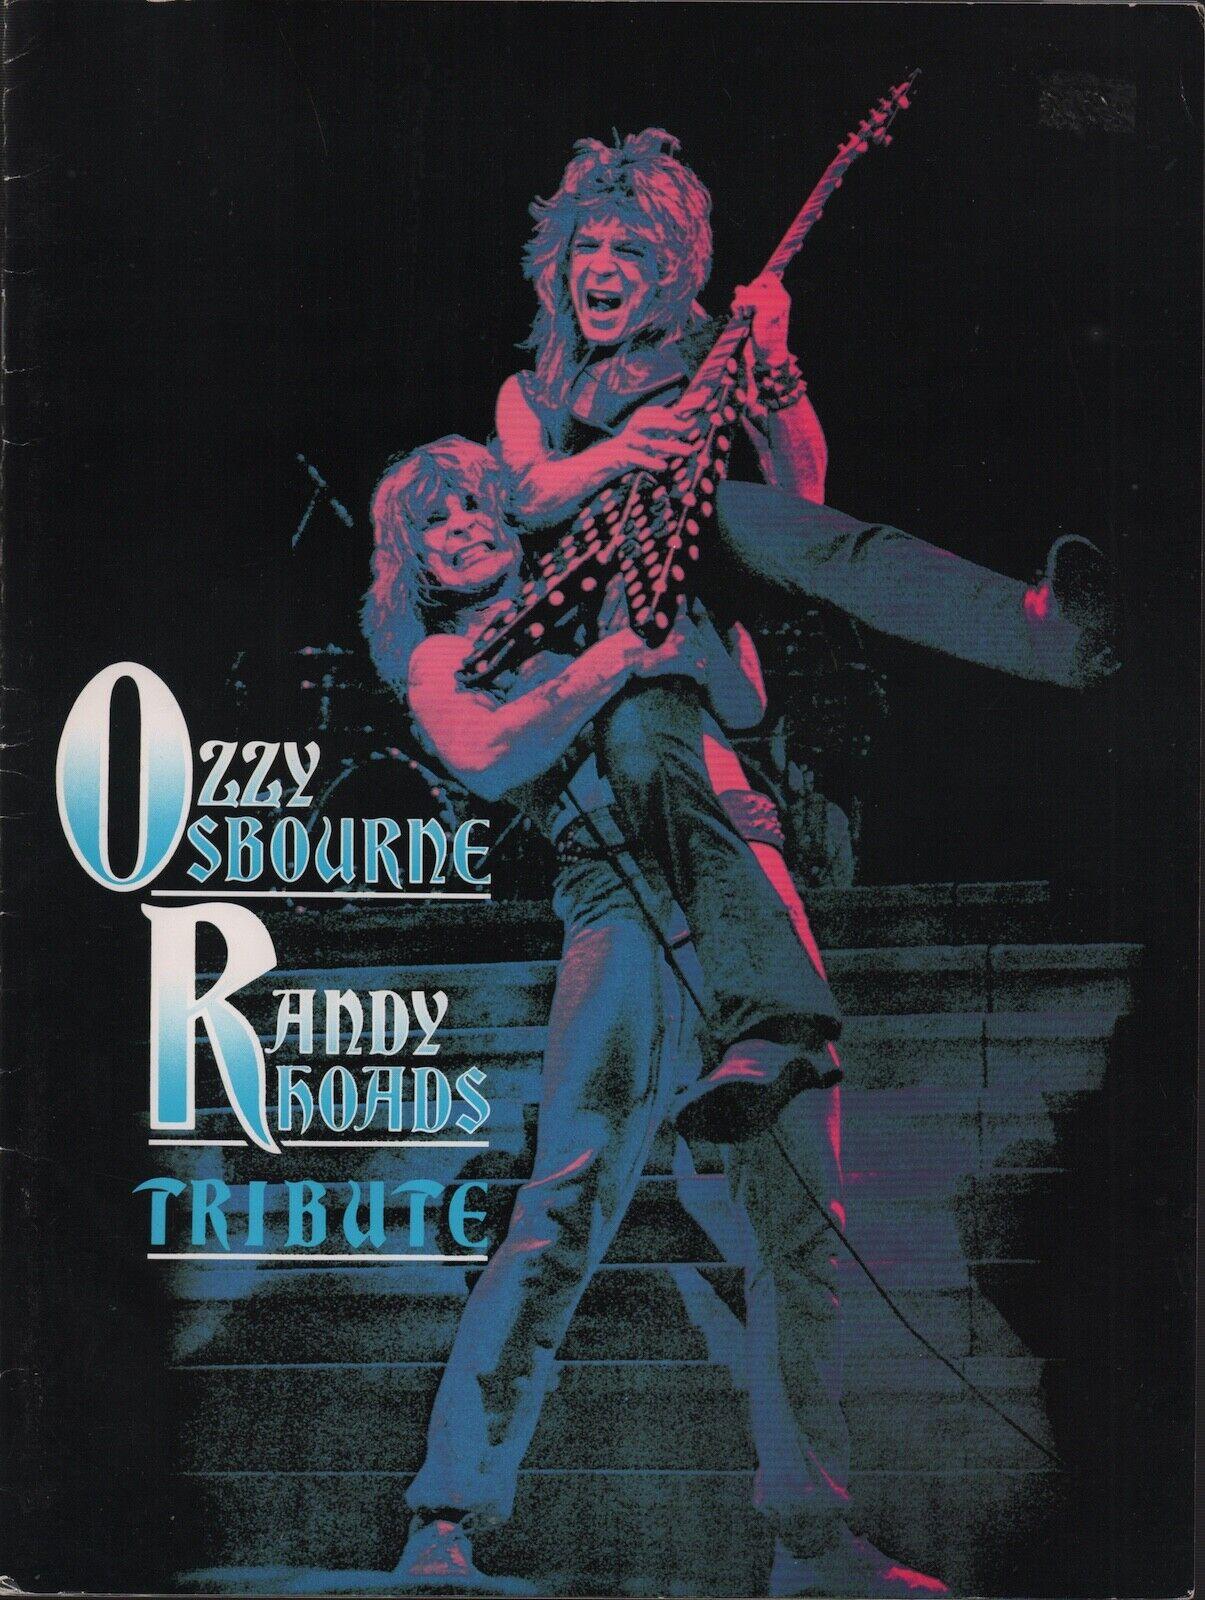 OZZY OSBOURNE / RANDY RHOADS 1987 TRIBUTE TOUR PROGRAM BOOK BOOKLET / EX 2 NMT